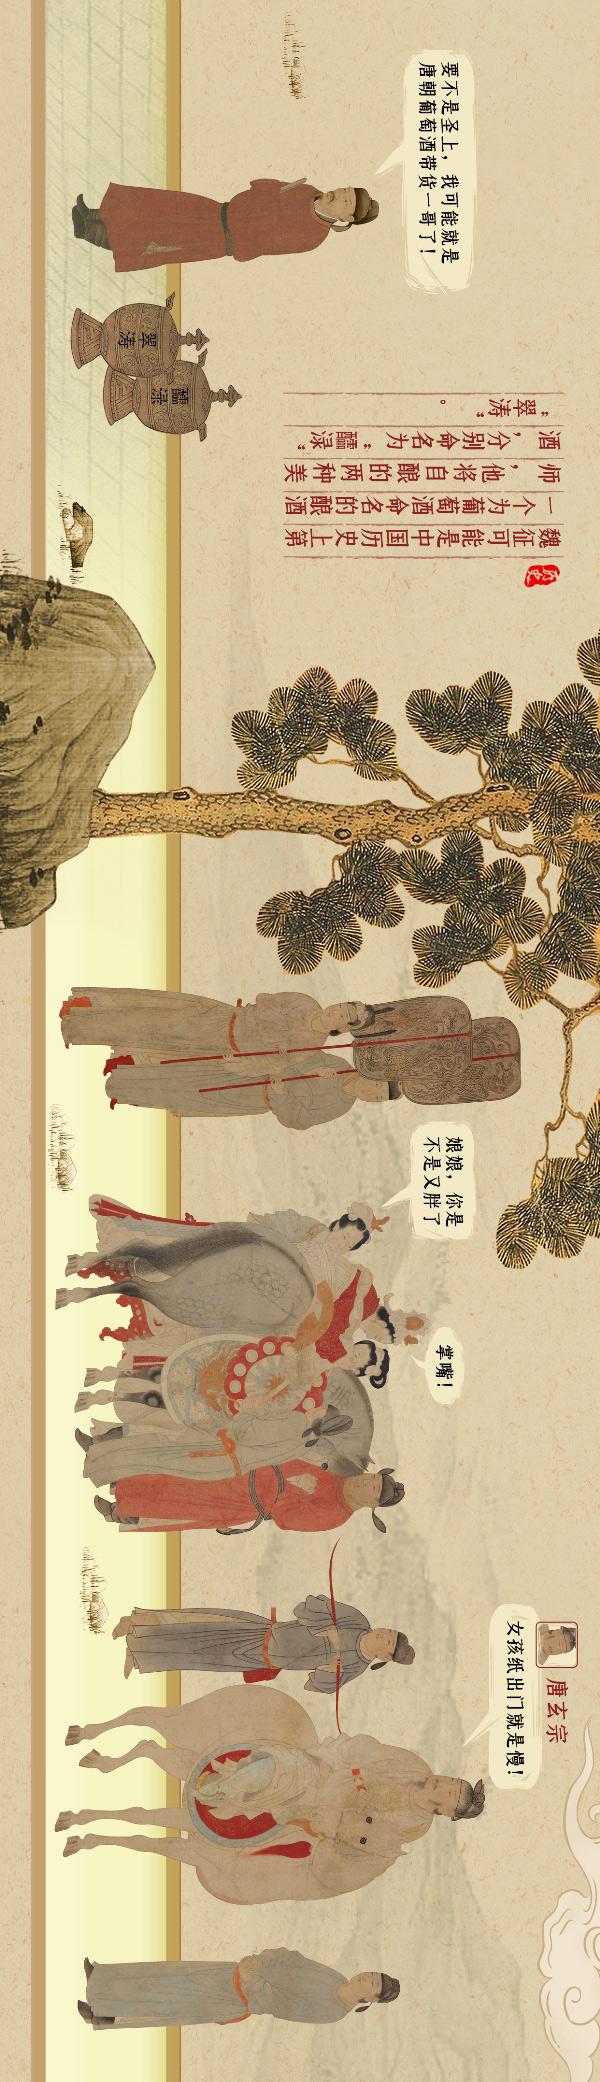 6葡萄�v史副本_副本_07